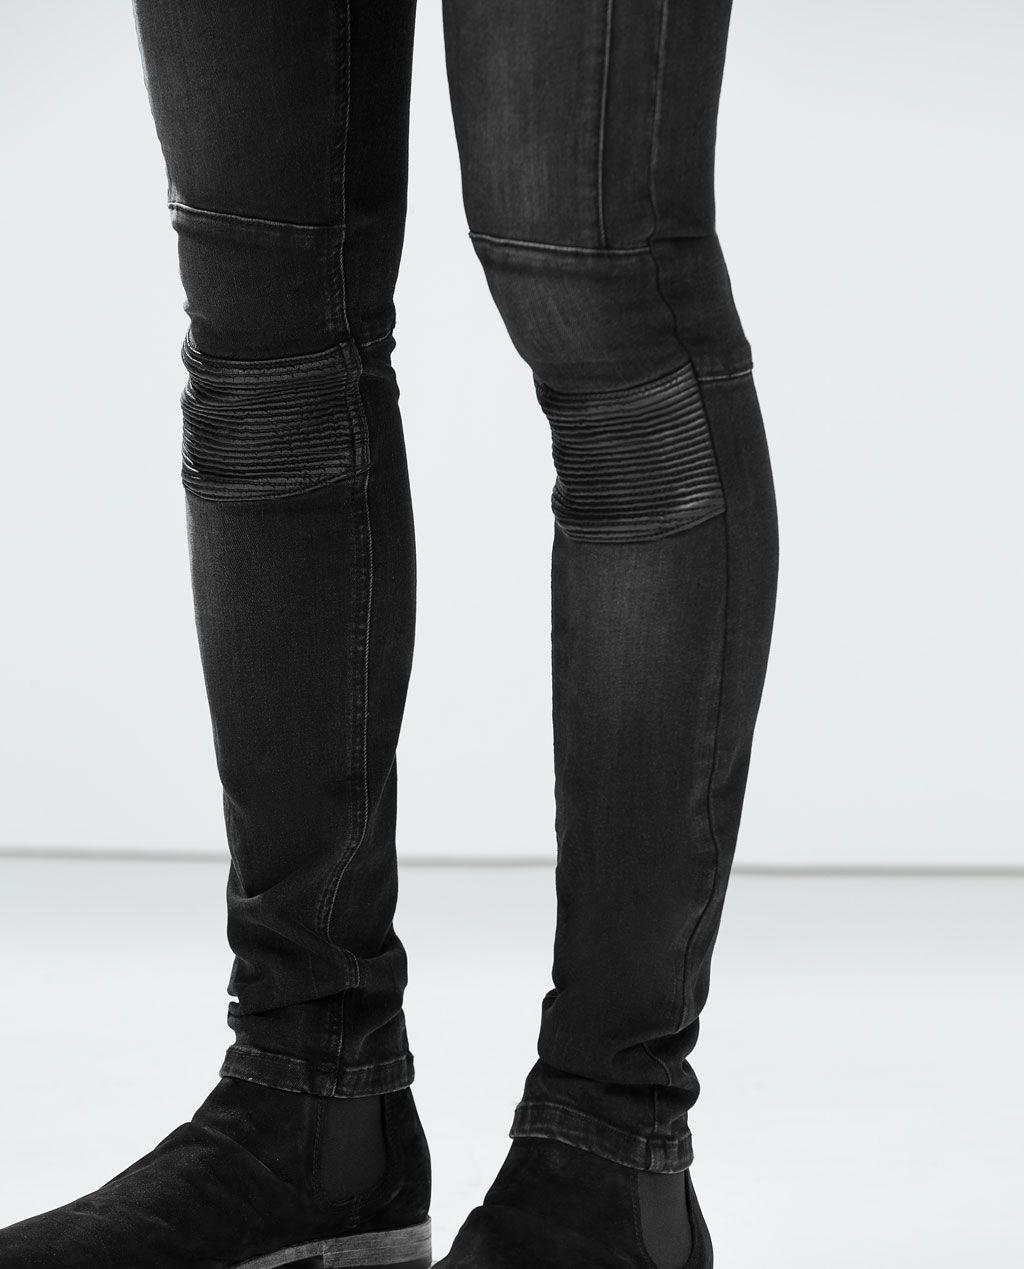 80069a67ac Interesting Biker Skinny Jeans | 2015 LookBook | Black moto jeans ...